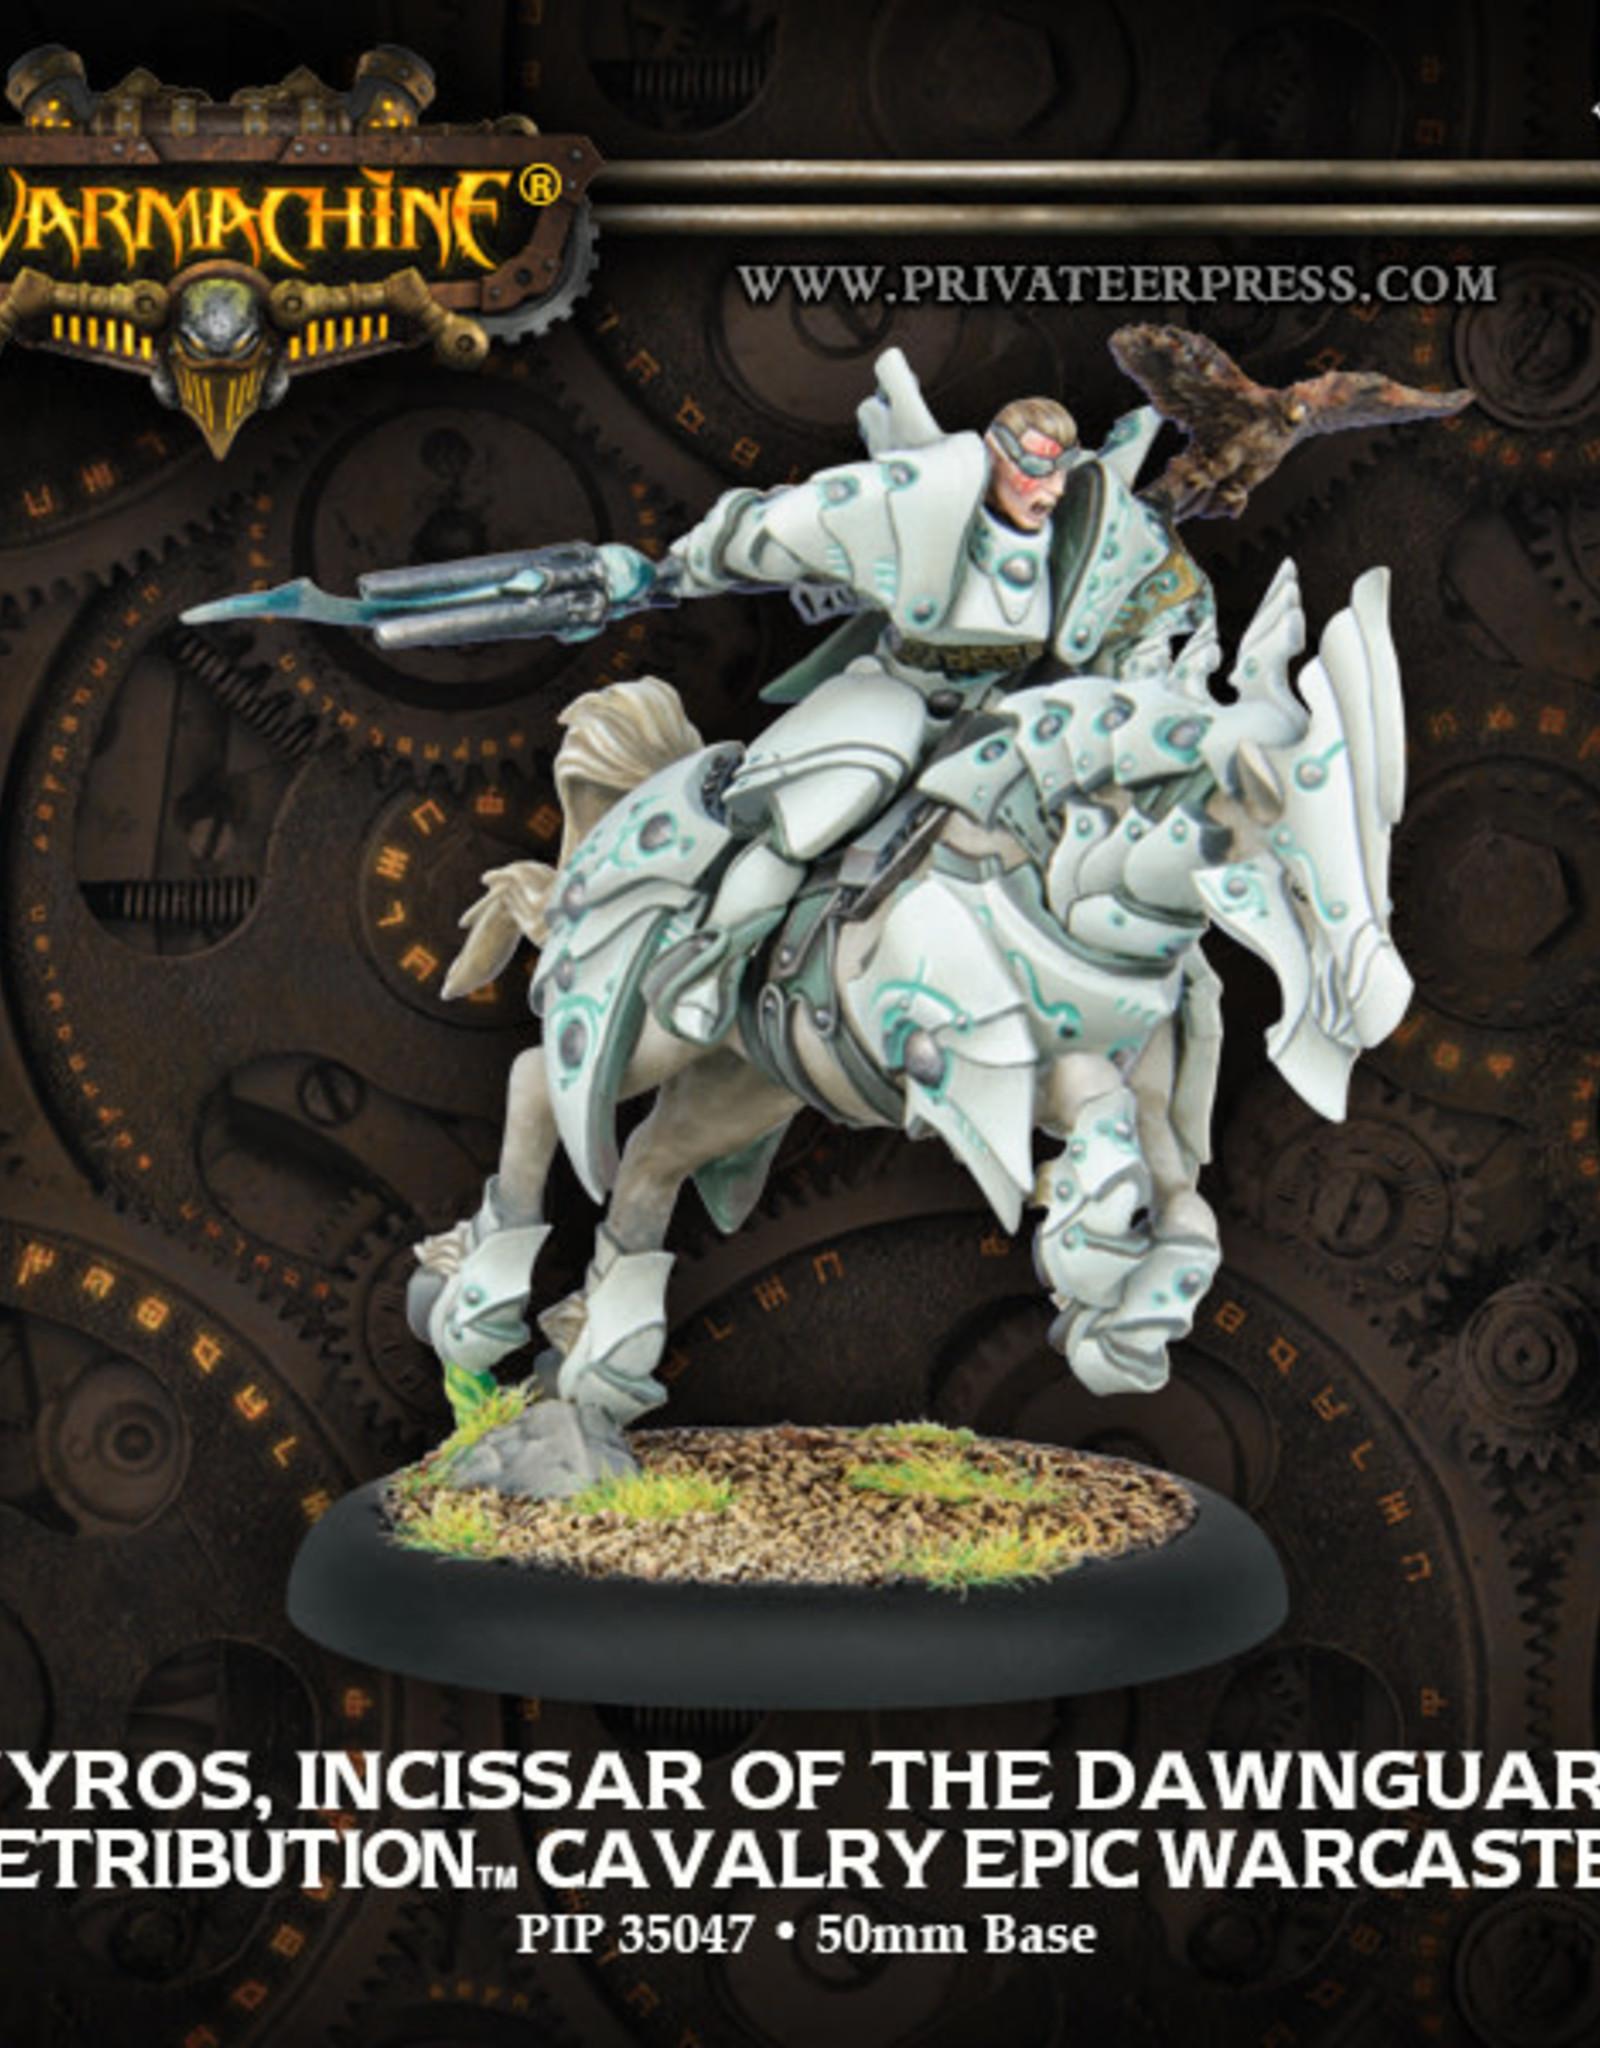 Warmachine Scyrah - Vyros, Incissar of the Dawnguard